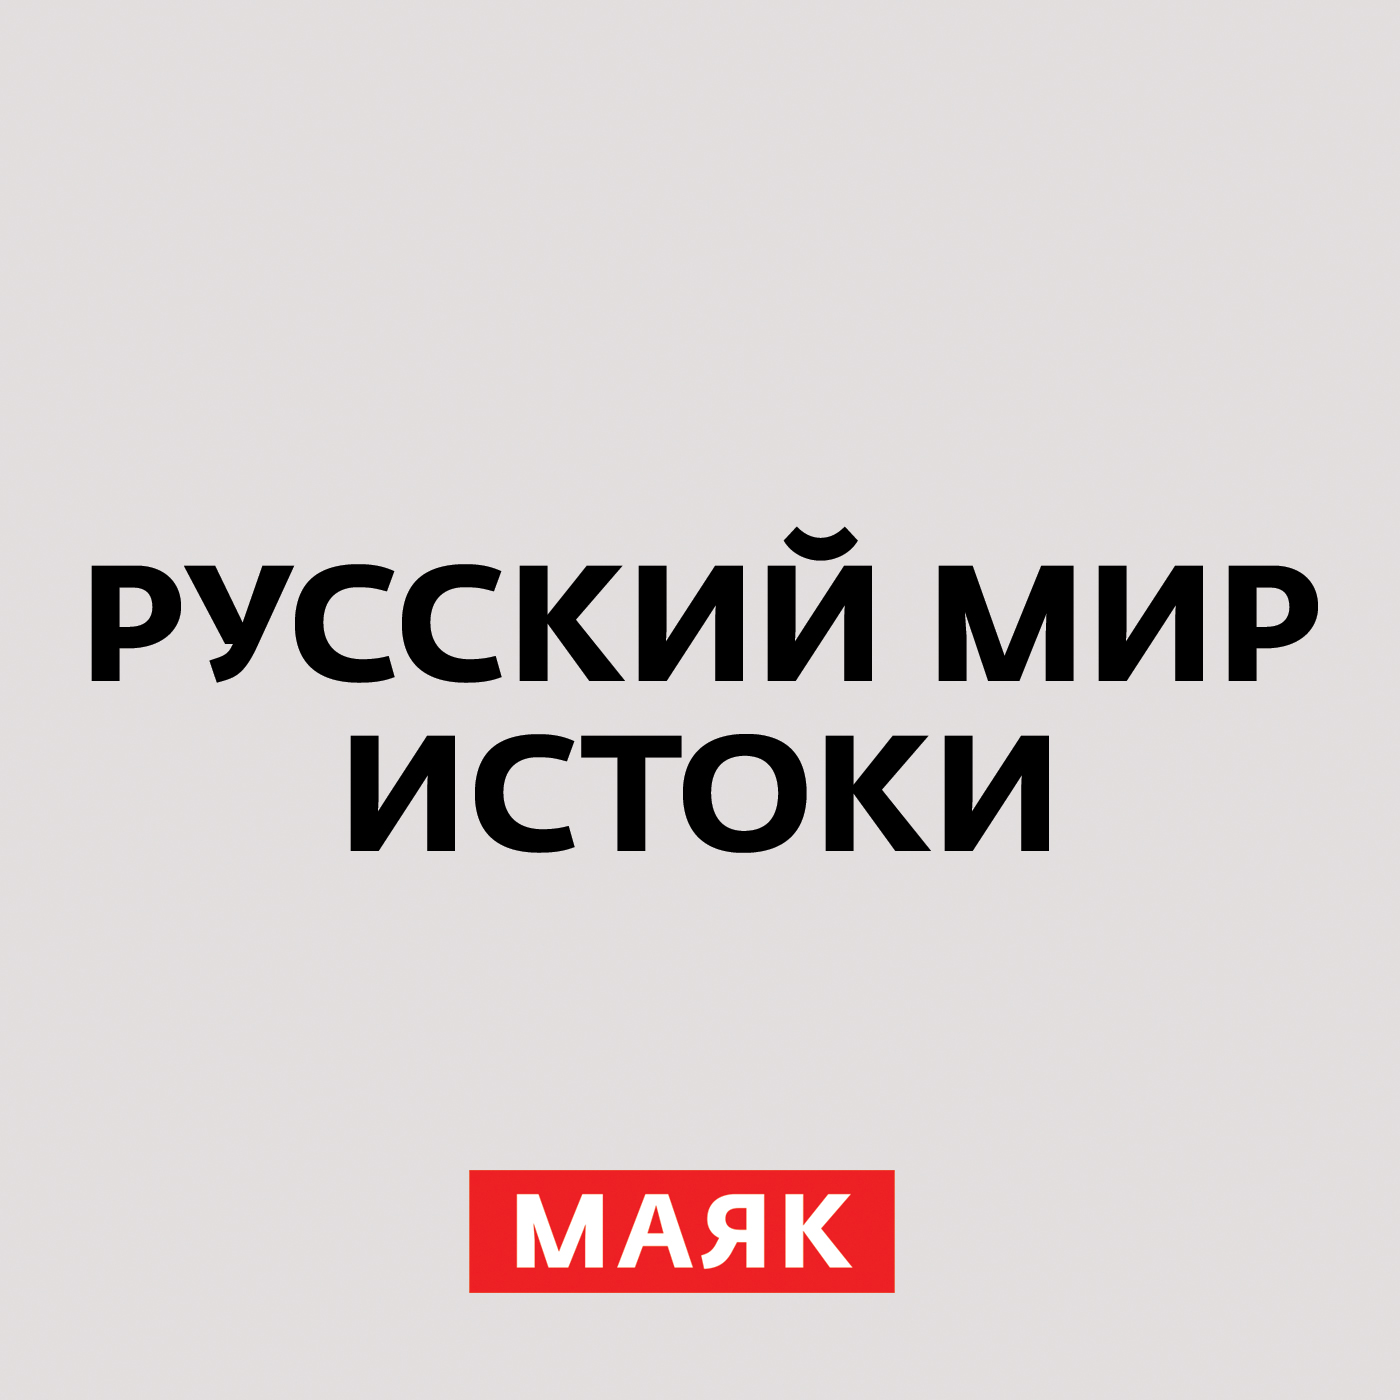 Творческий коллектив радио «Маяк» Иван III Васильевич творческий коллектив радио маяк екатерина ii часть 3